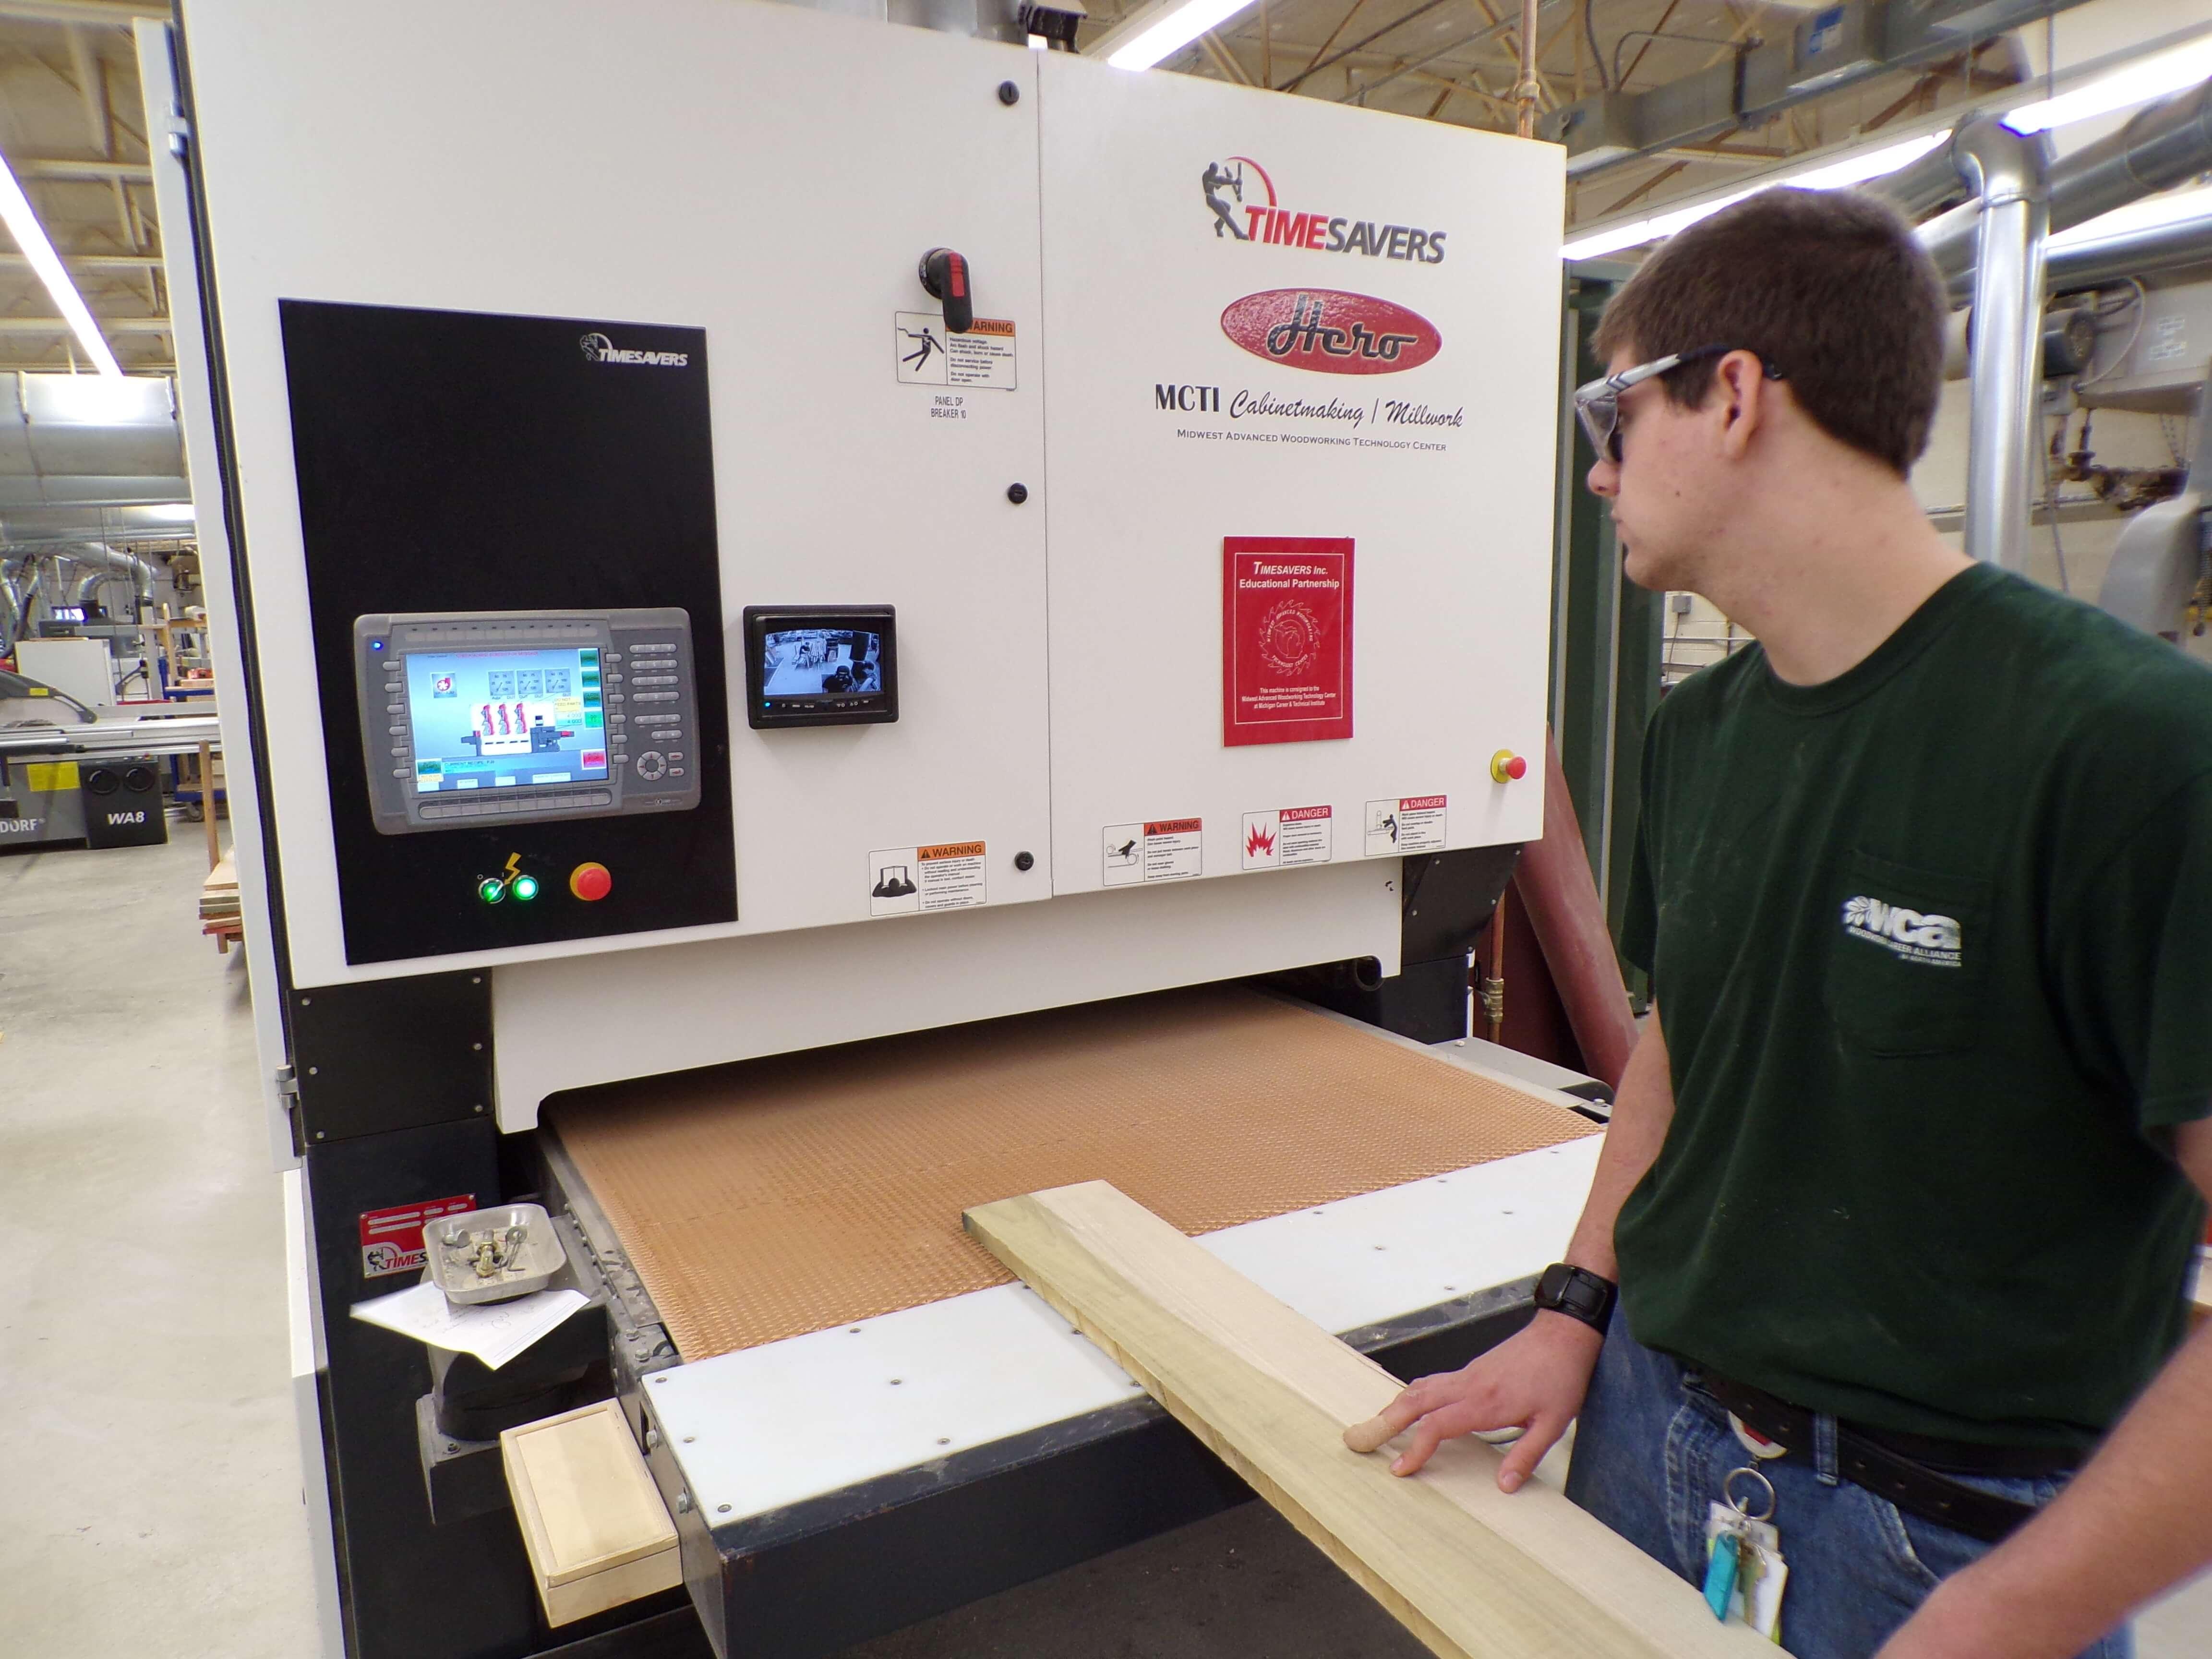 Ausbildung: Auszubildene bei der Arbeit mit Holzbearbeitungsmaschinen